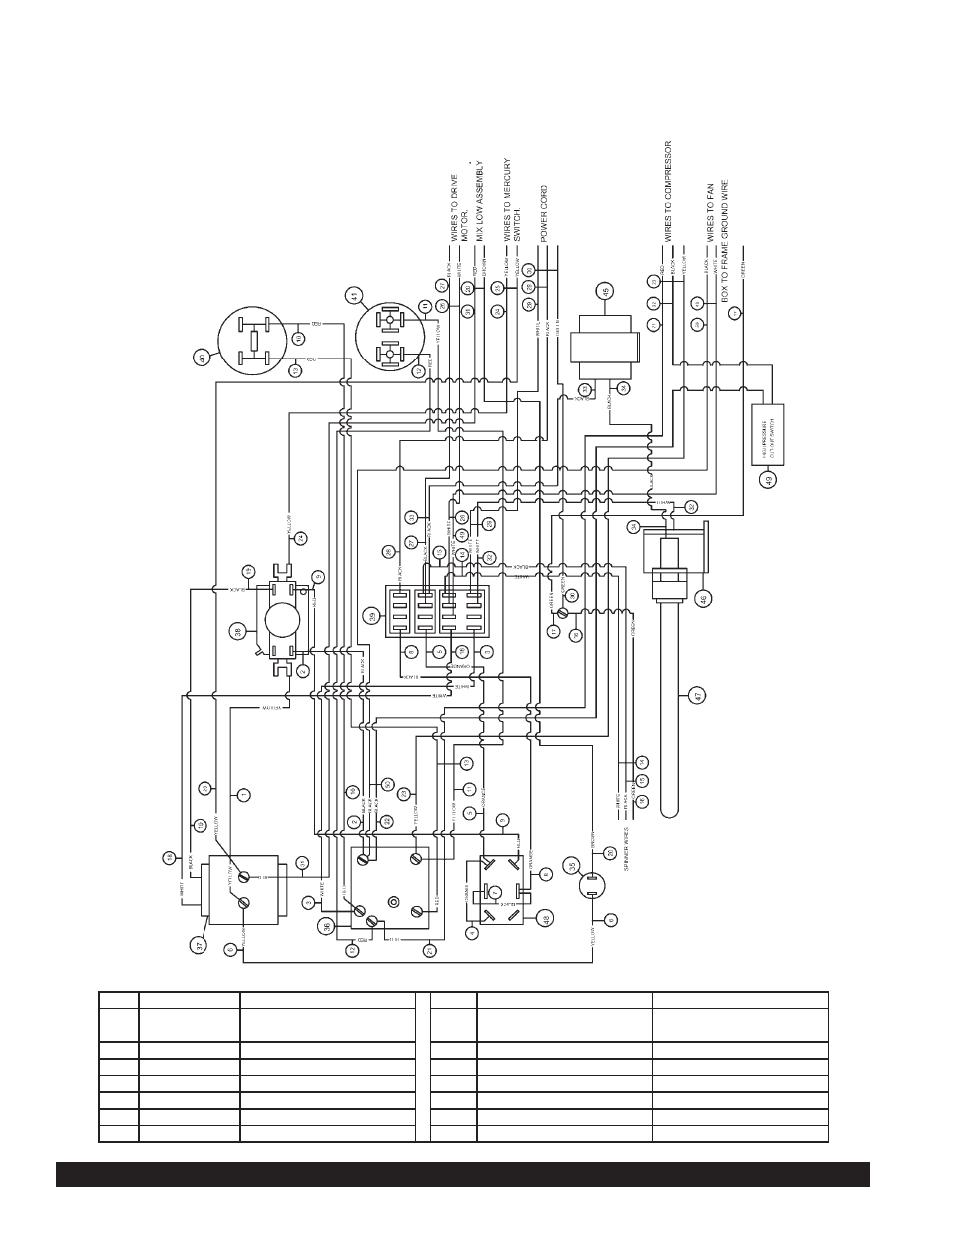 Bunn Coffee Maker User Manual Hg Wiring Diagram